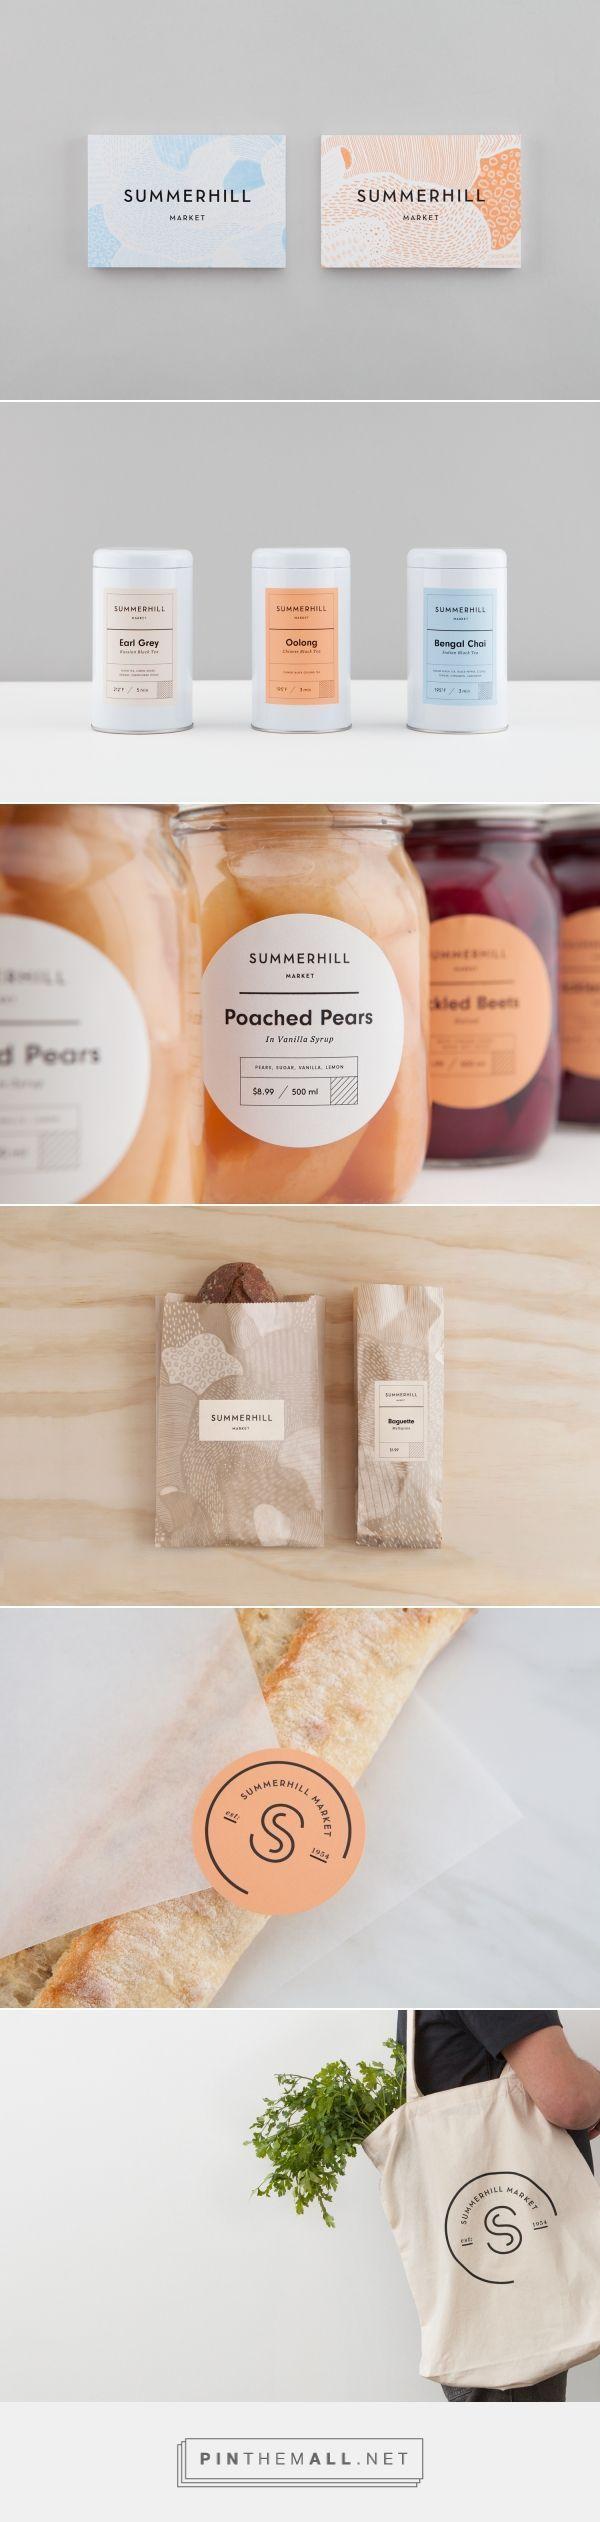 Summerhill Market Packaging and Branding Design